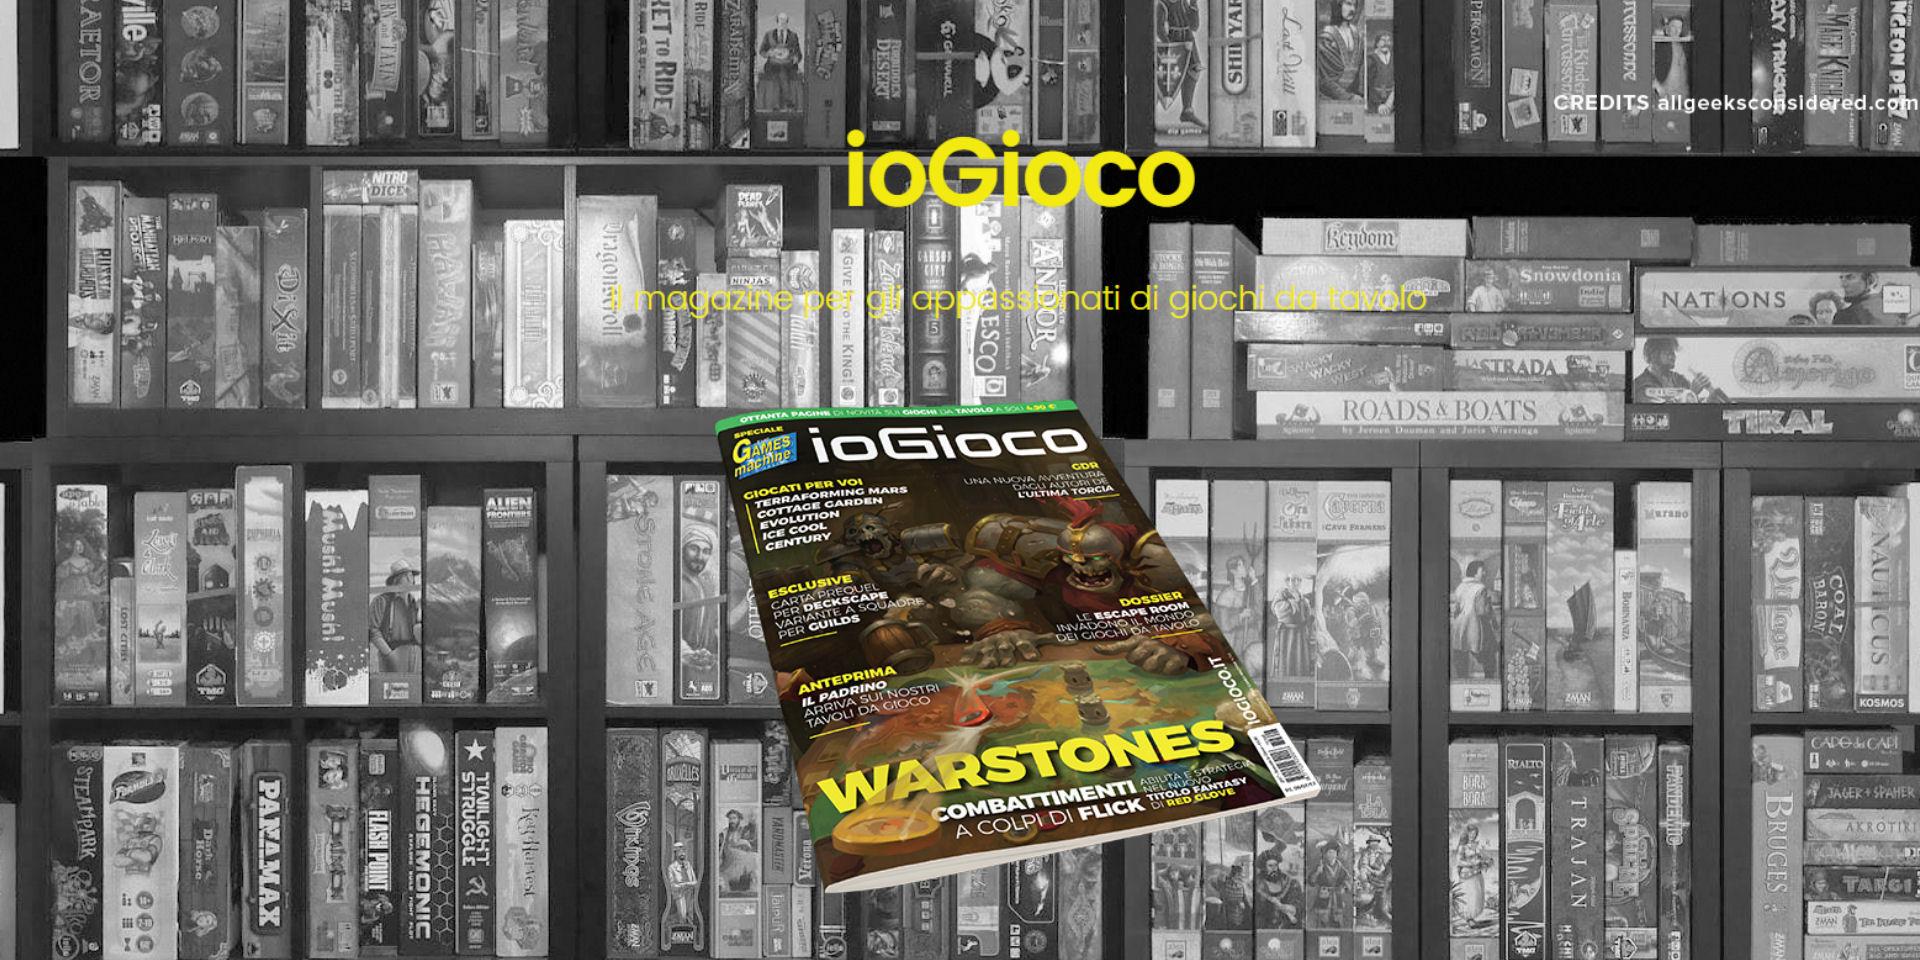 Io Gioco by The Games Machine